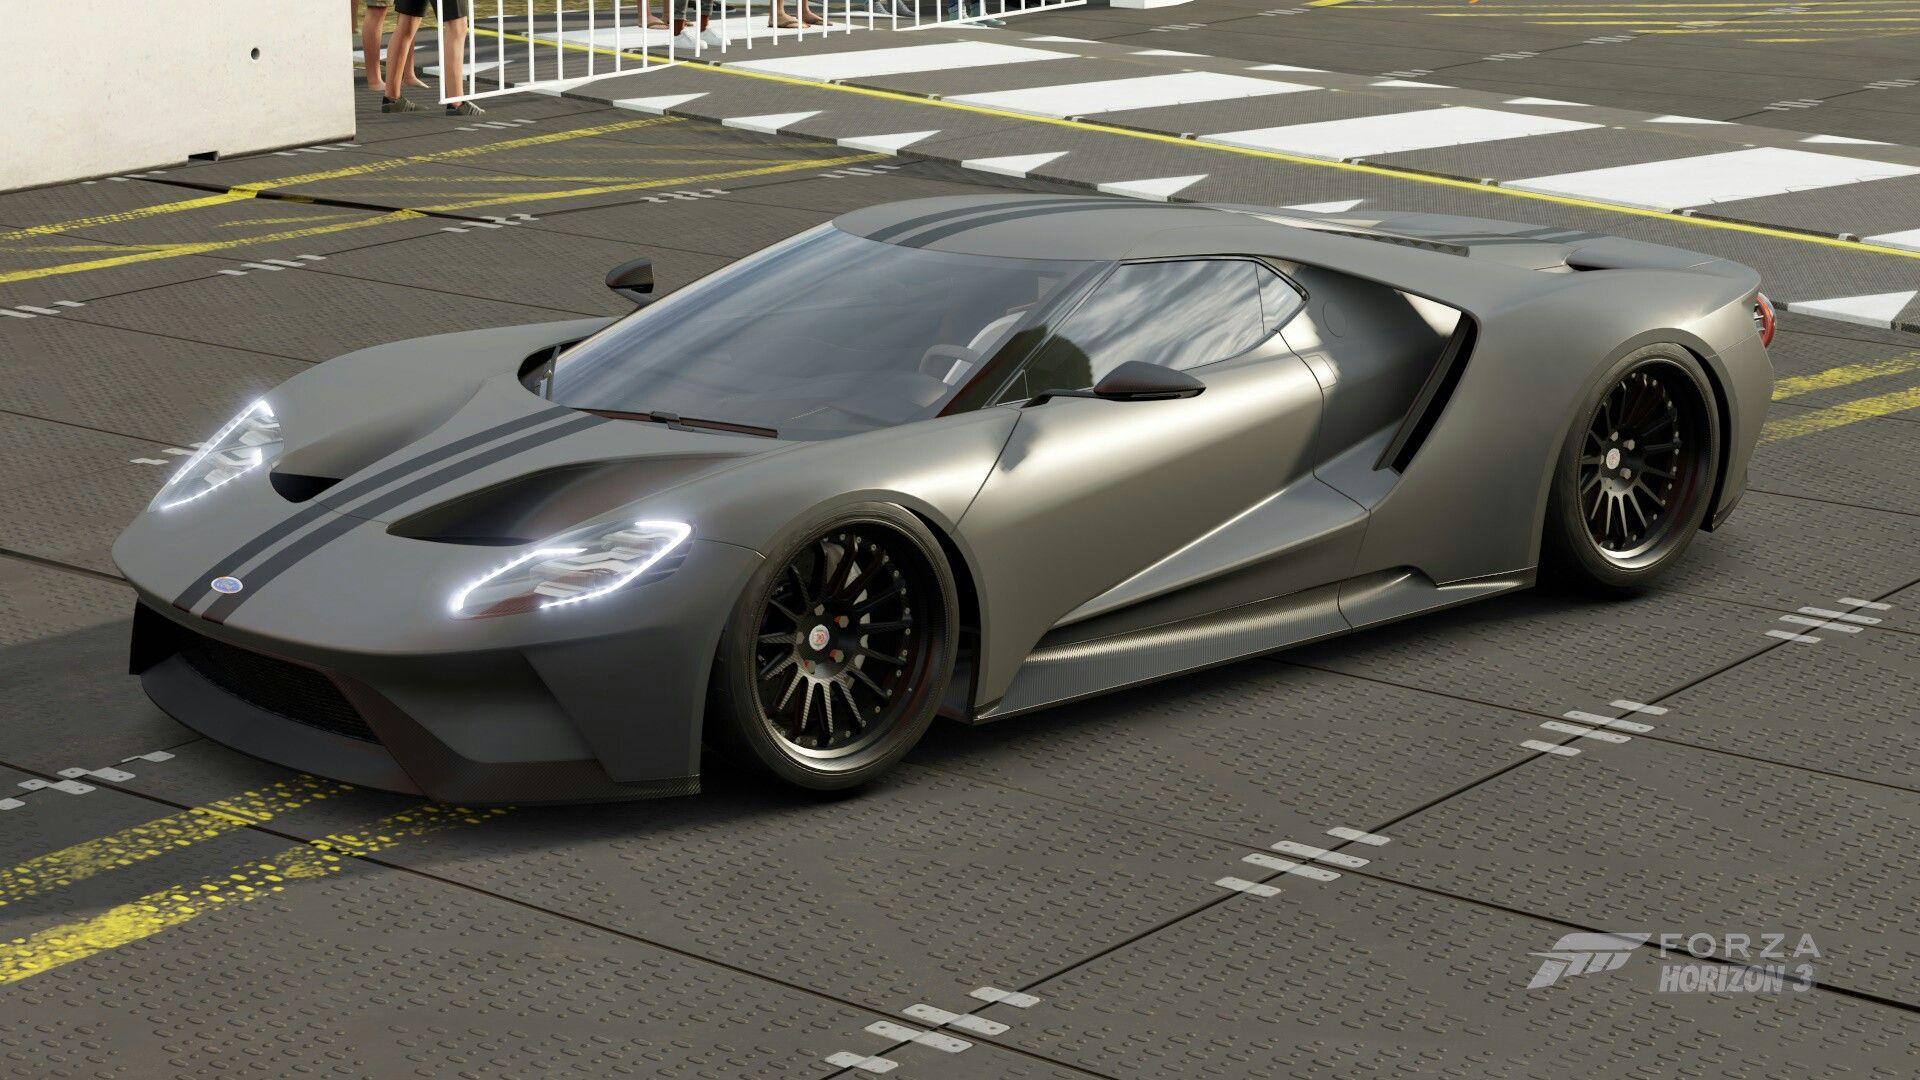 Ford Gt  Forza Horizon  Stealth Grey Carbon Fibre Ford Gt  Forza Horizon